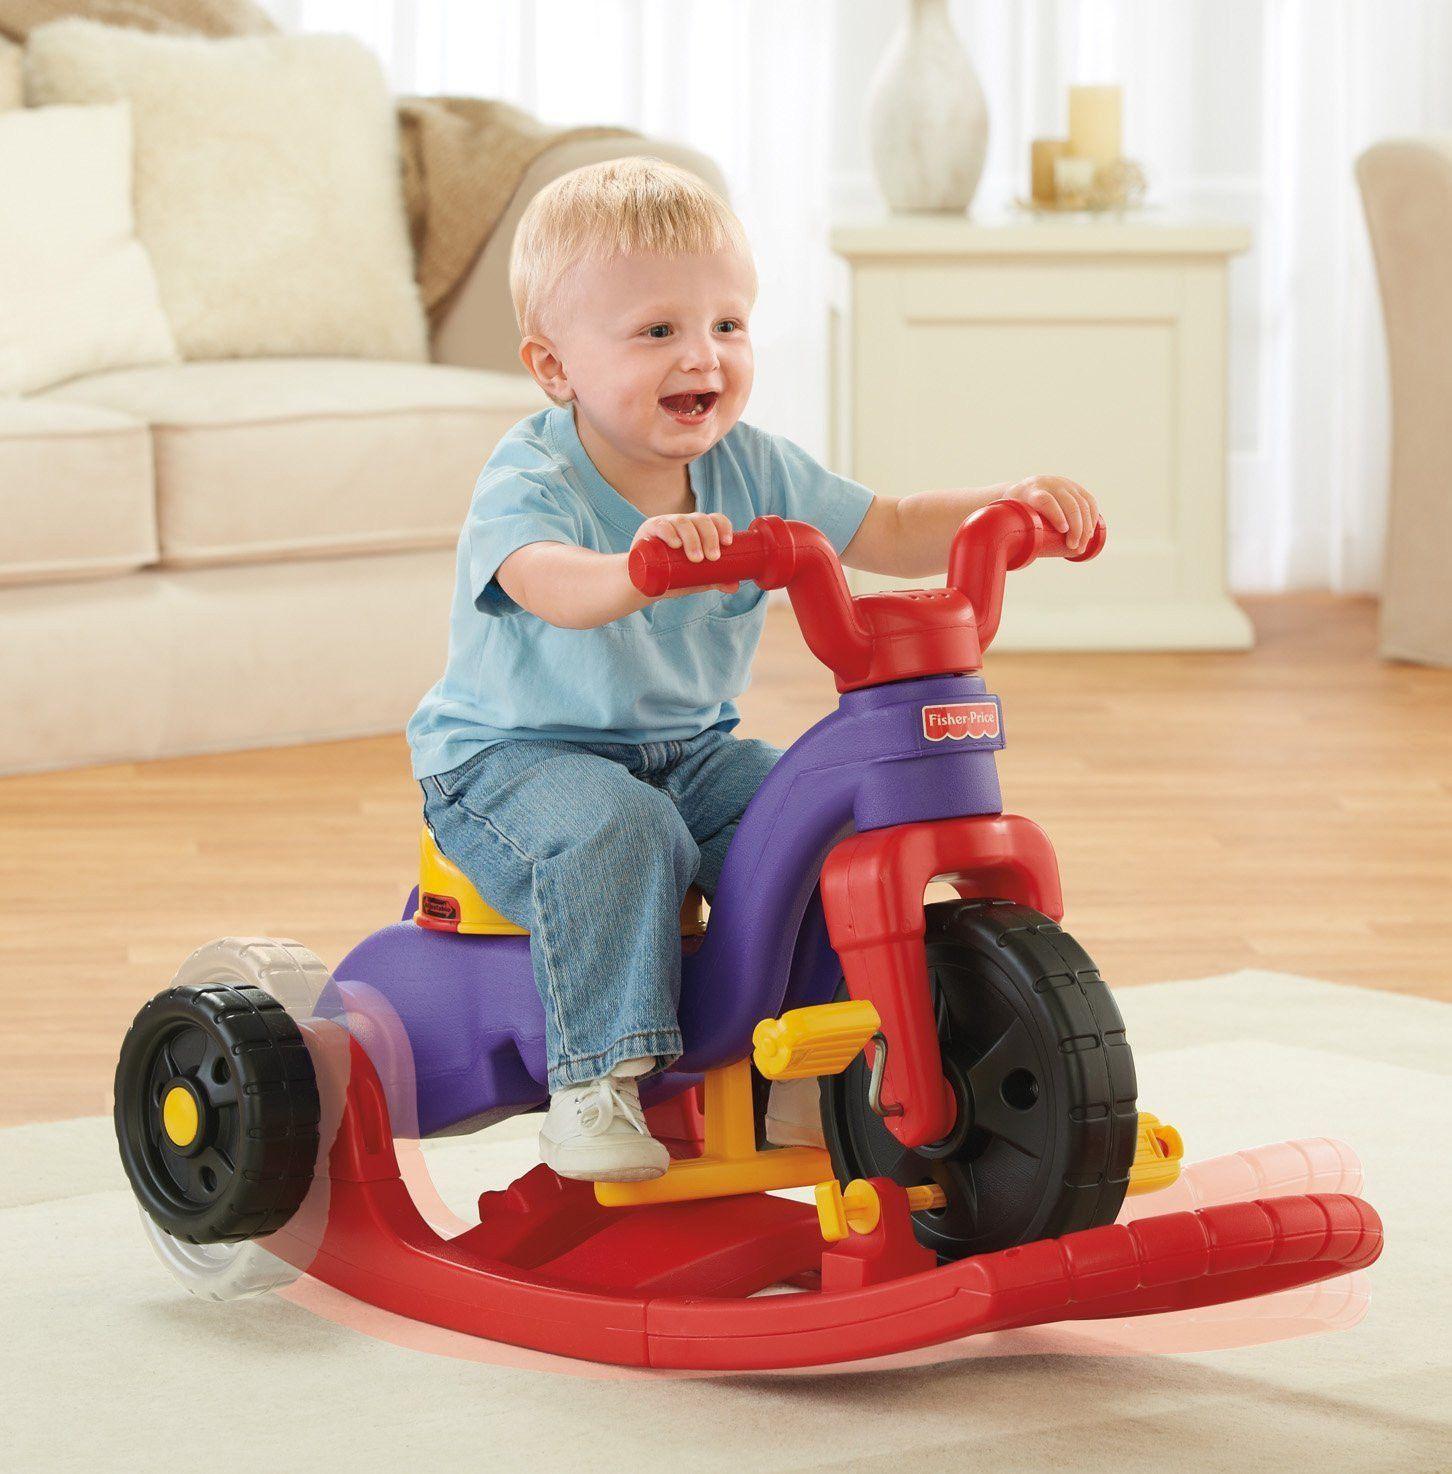 FisherPrice Kids, Toddlers Rock, Roll 'n Ride On Push